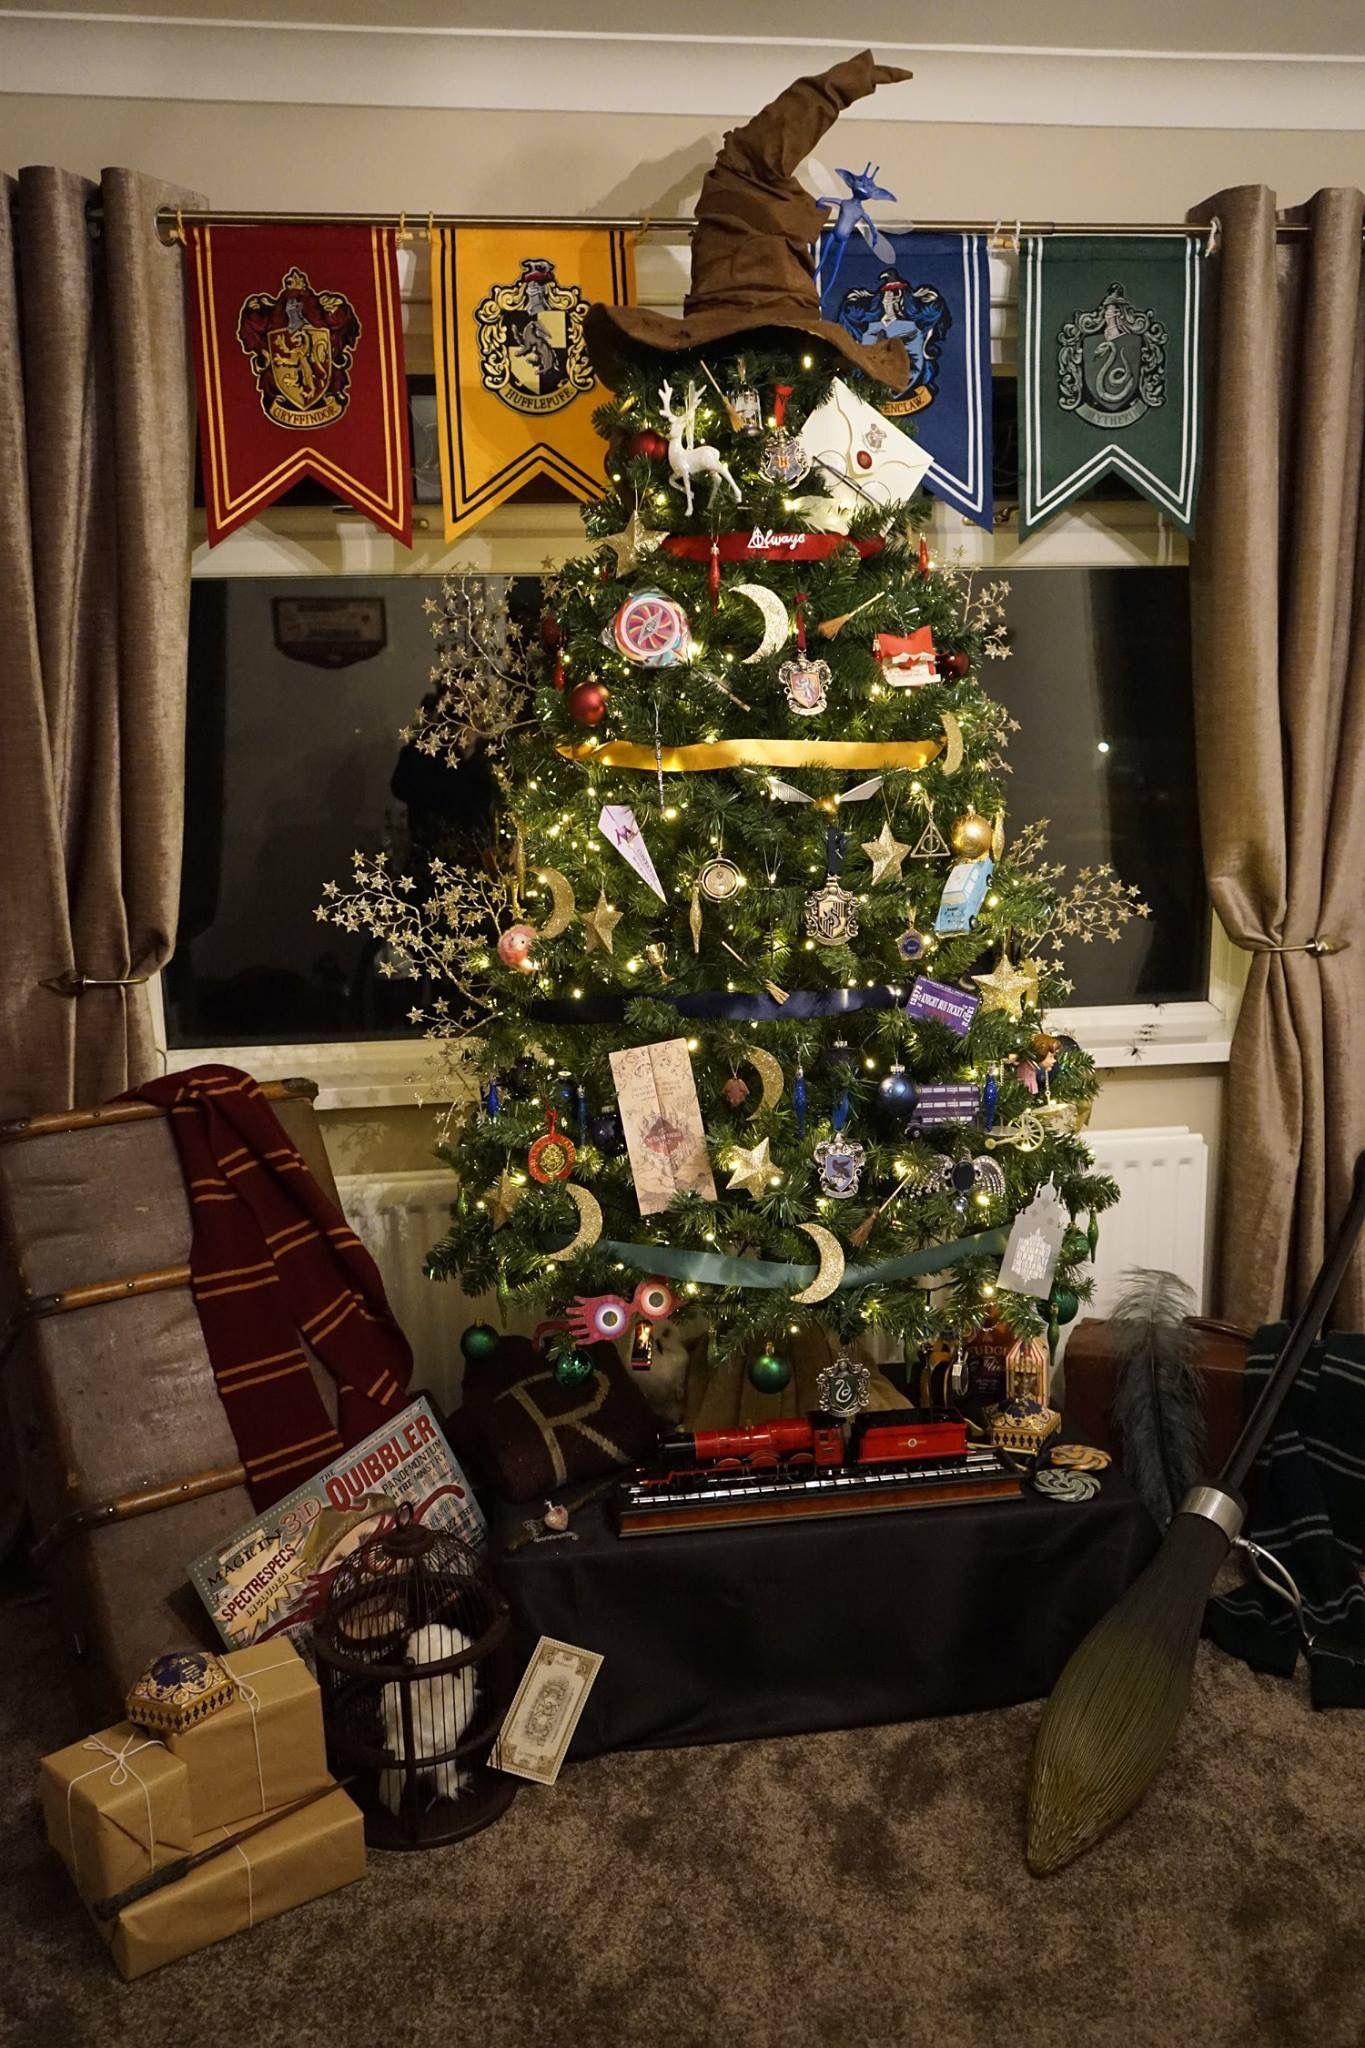 Harry Potter Ornaments Harry Potter Christmas Decorations Harry Potter Christmas Tree Hogwarts Christmas